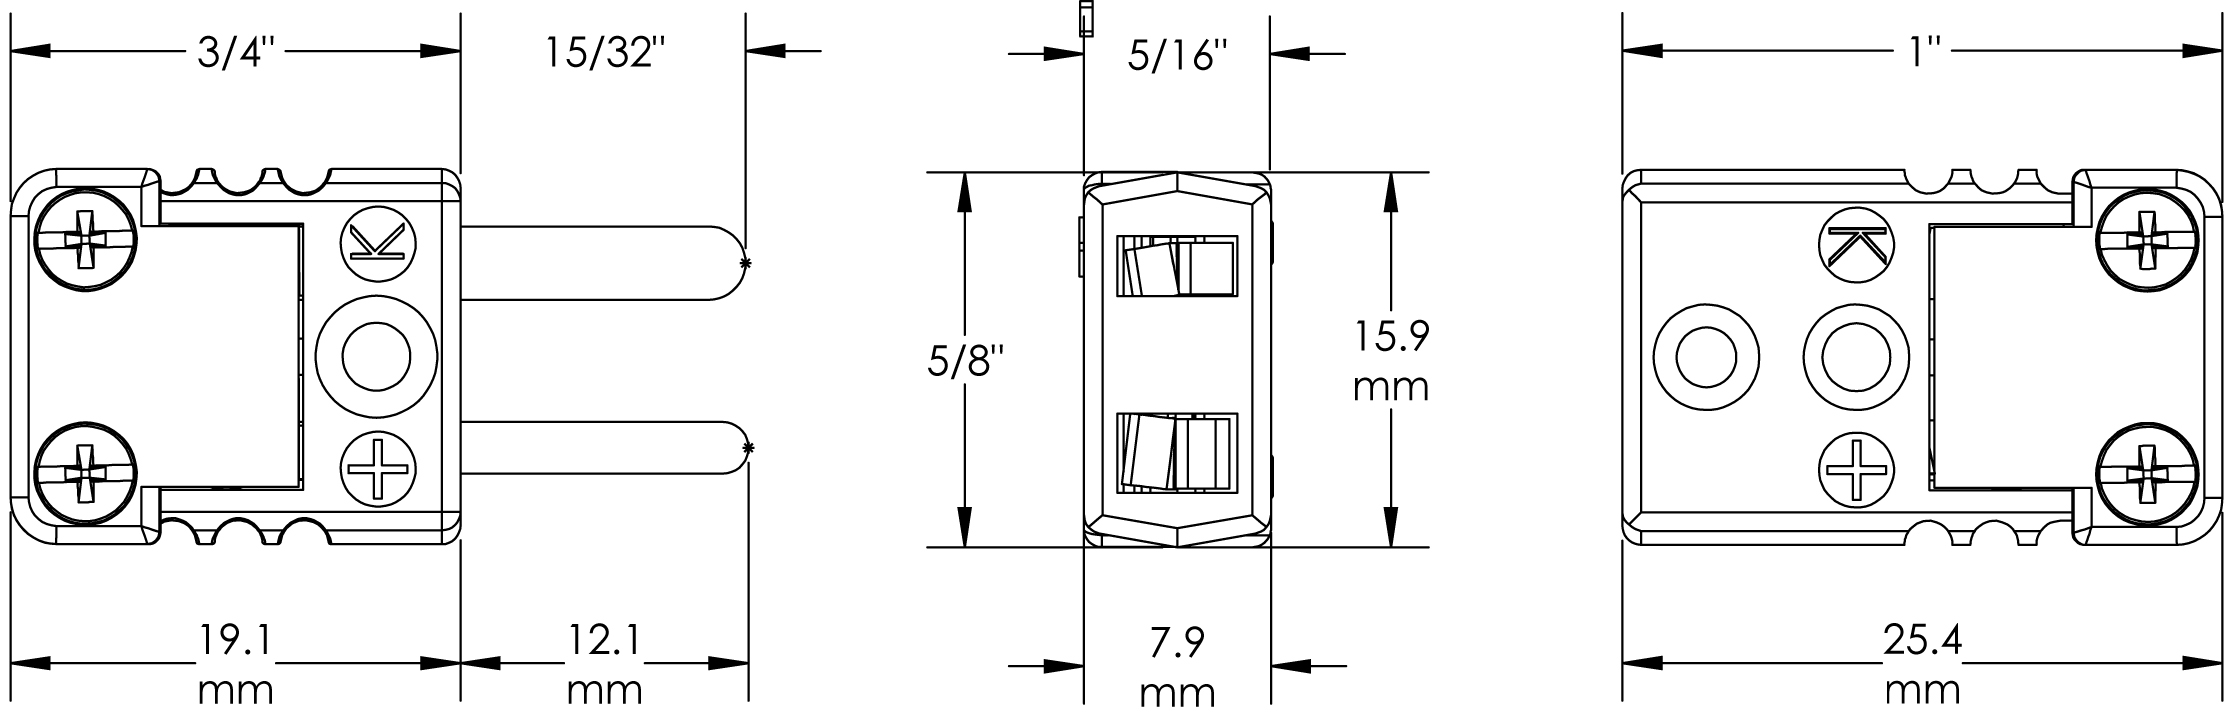 high-resolution-dimensions-mini-2-pole.jpg